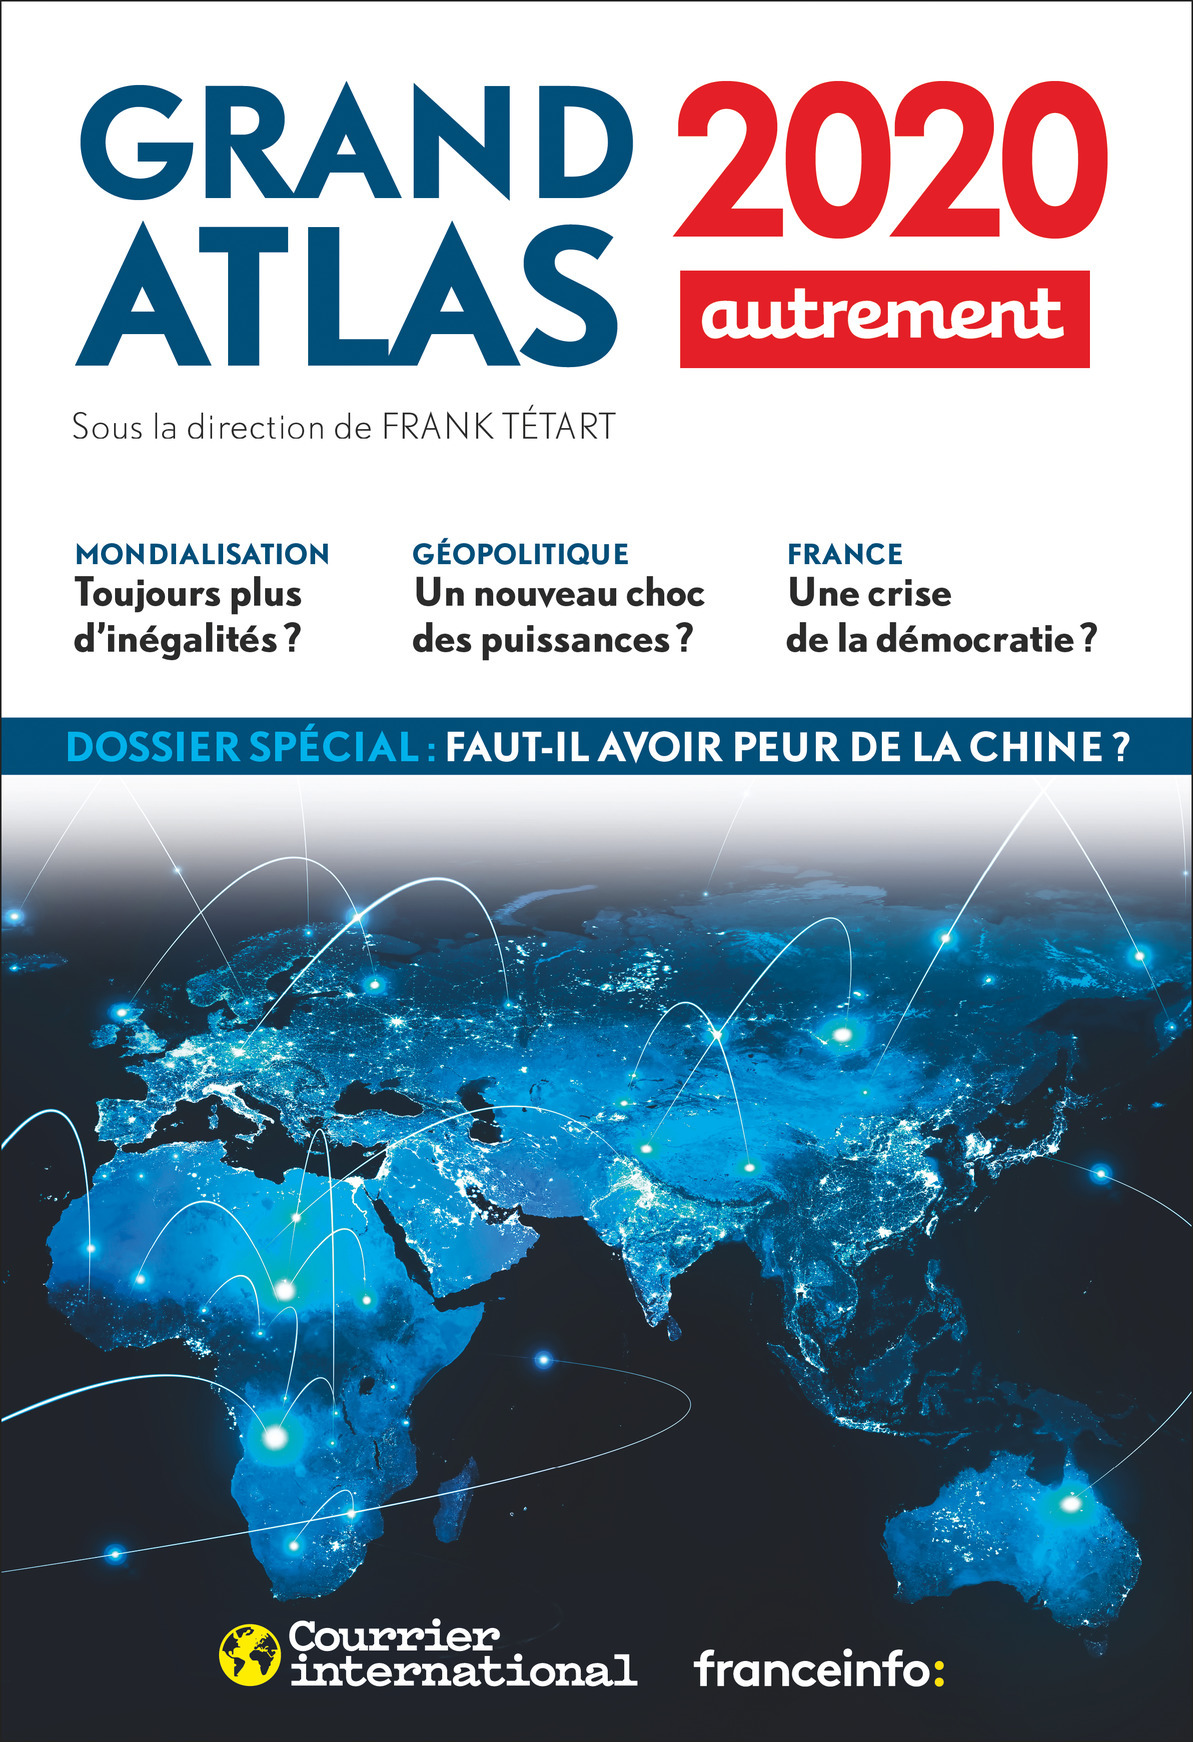 GRAND ATLAS 2020 - COMPRENDRE LE MONDE EN 100 CARTES